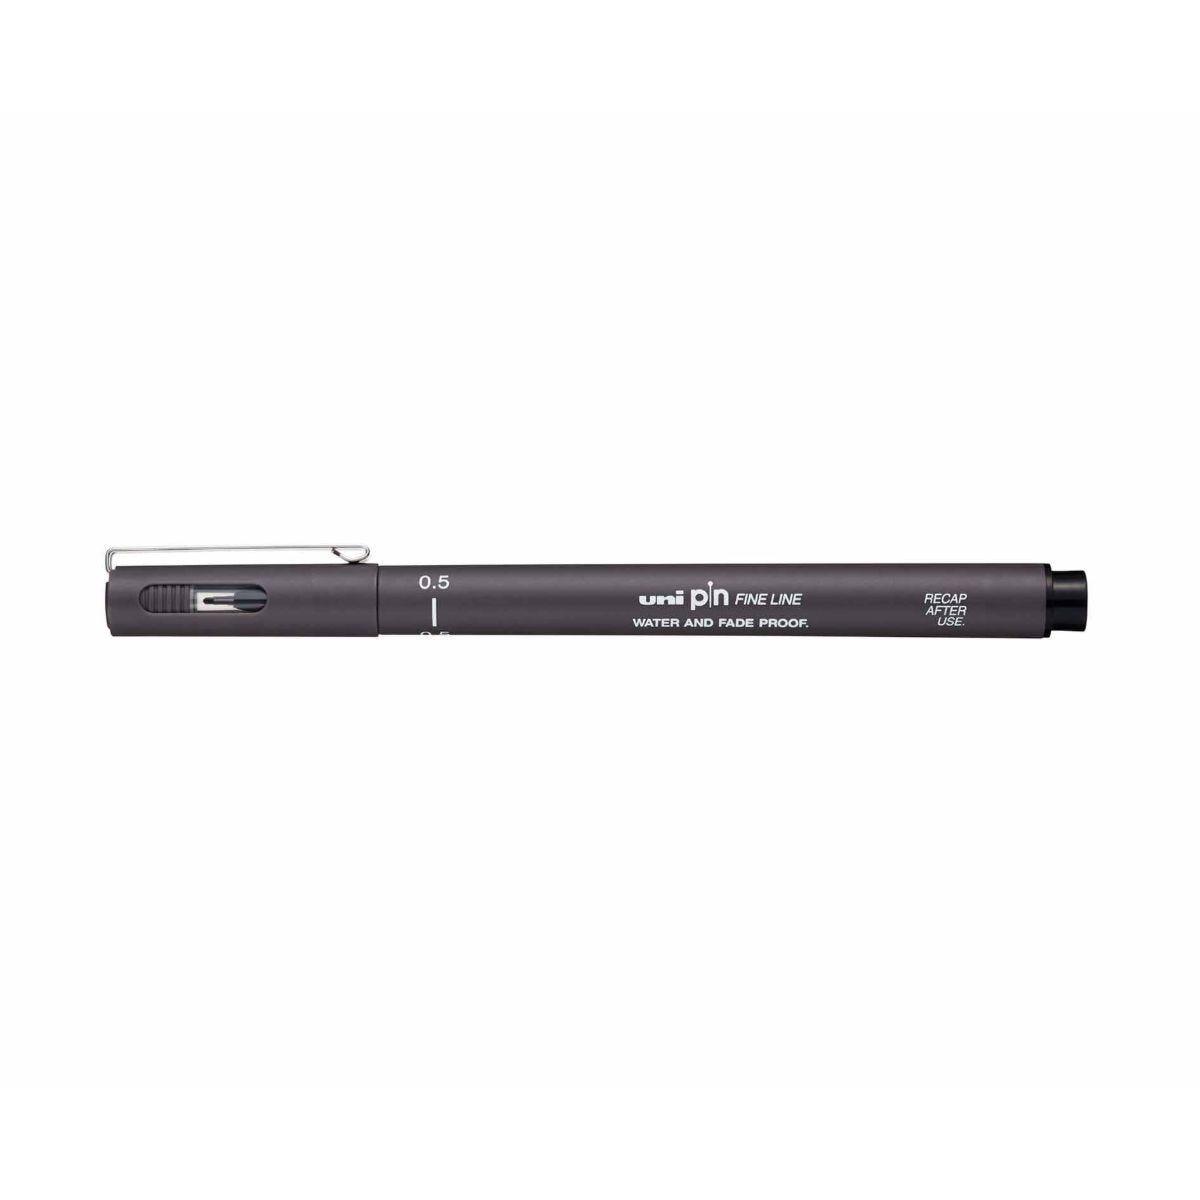 uni-ball Drawing Pen PIN 200 0.5 Loose Dark Grey